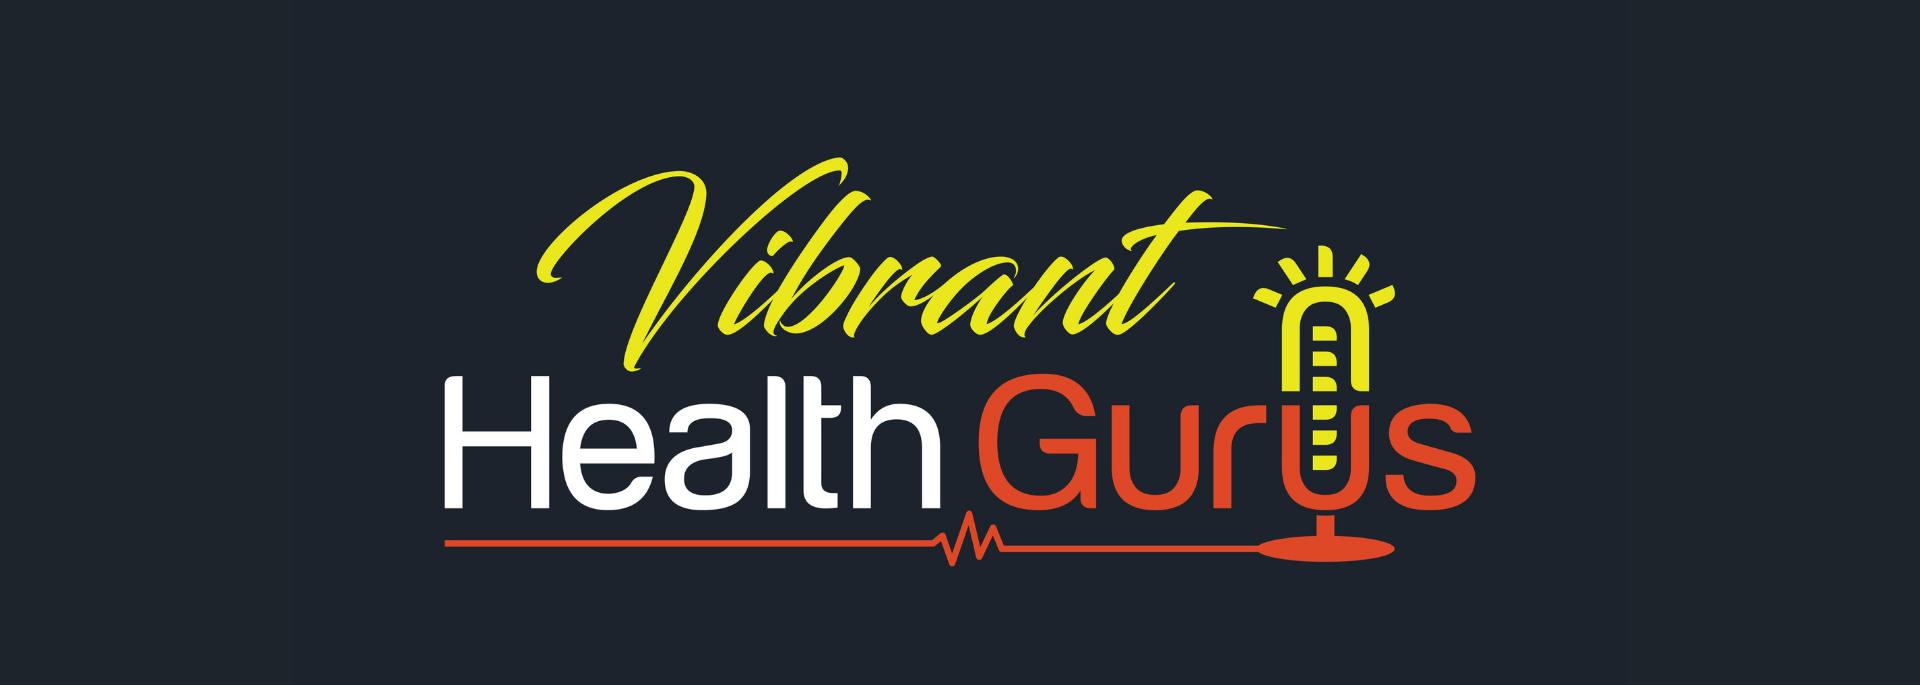 VIBRANT HEALTH GURUS channel